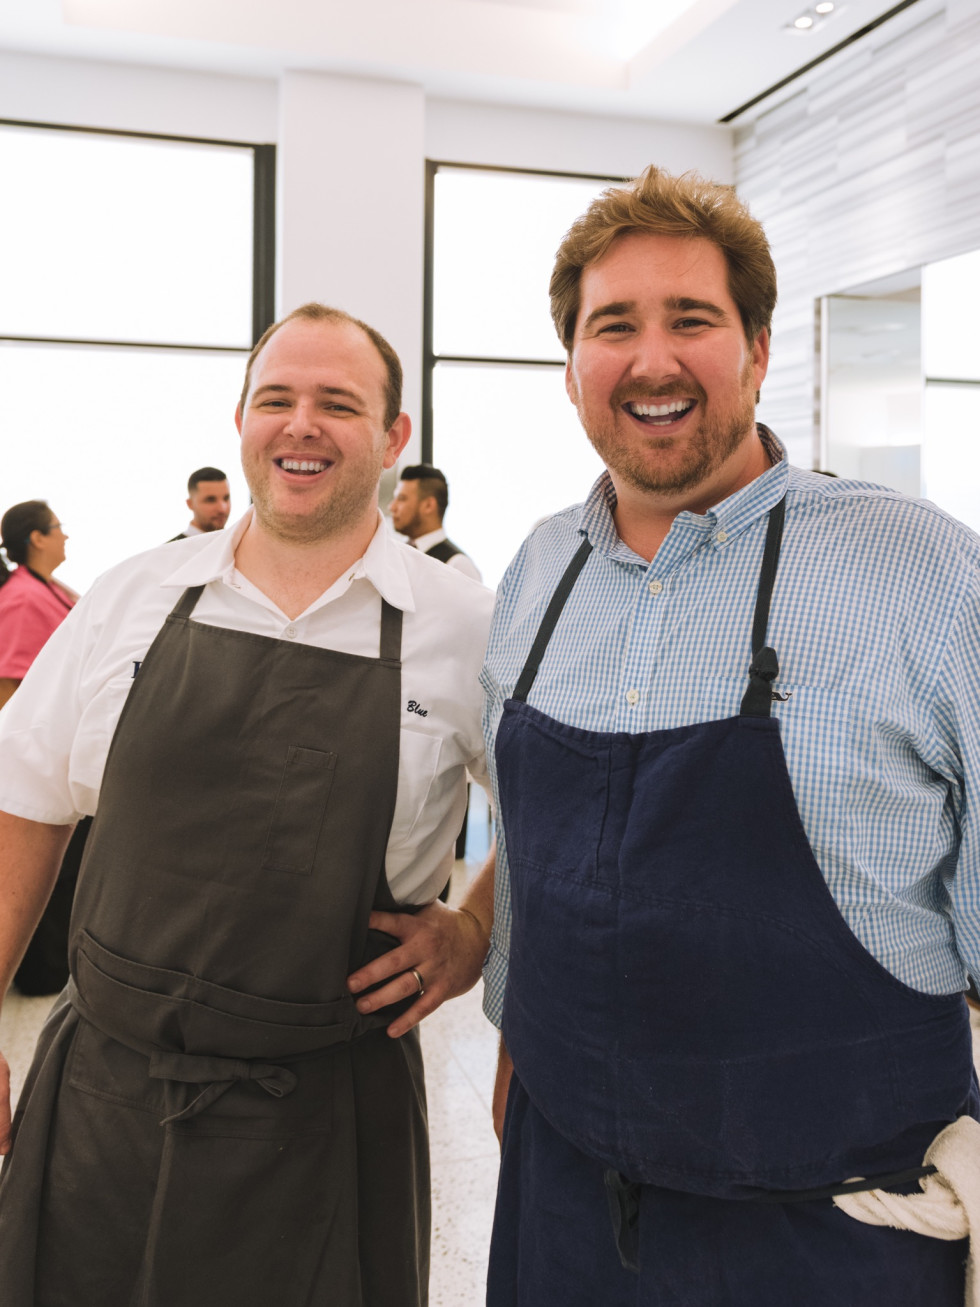 Eunice chefs Daniel Blue and Drake Leonards